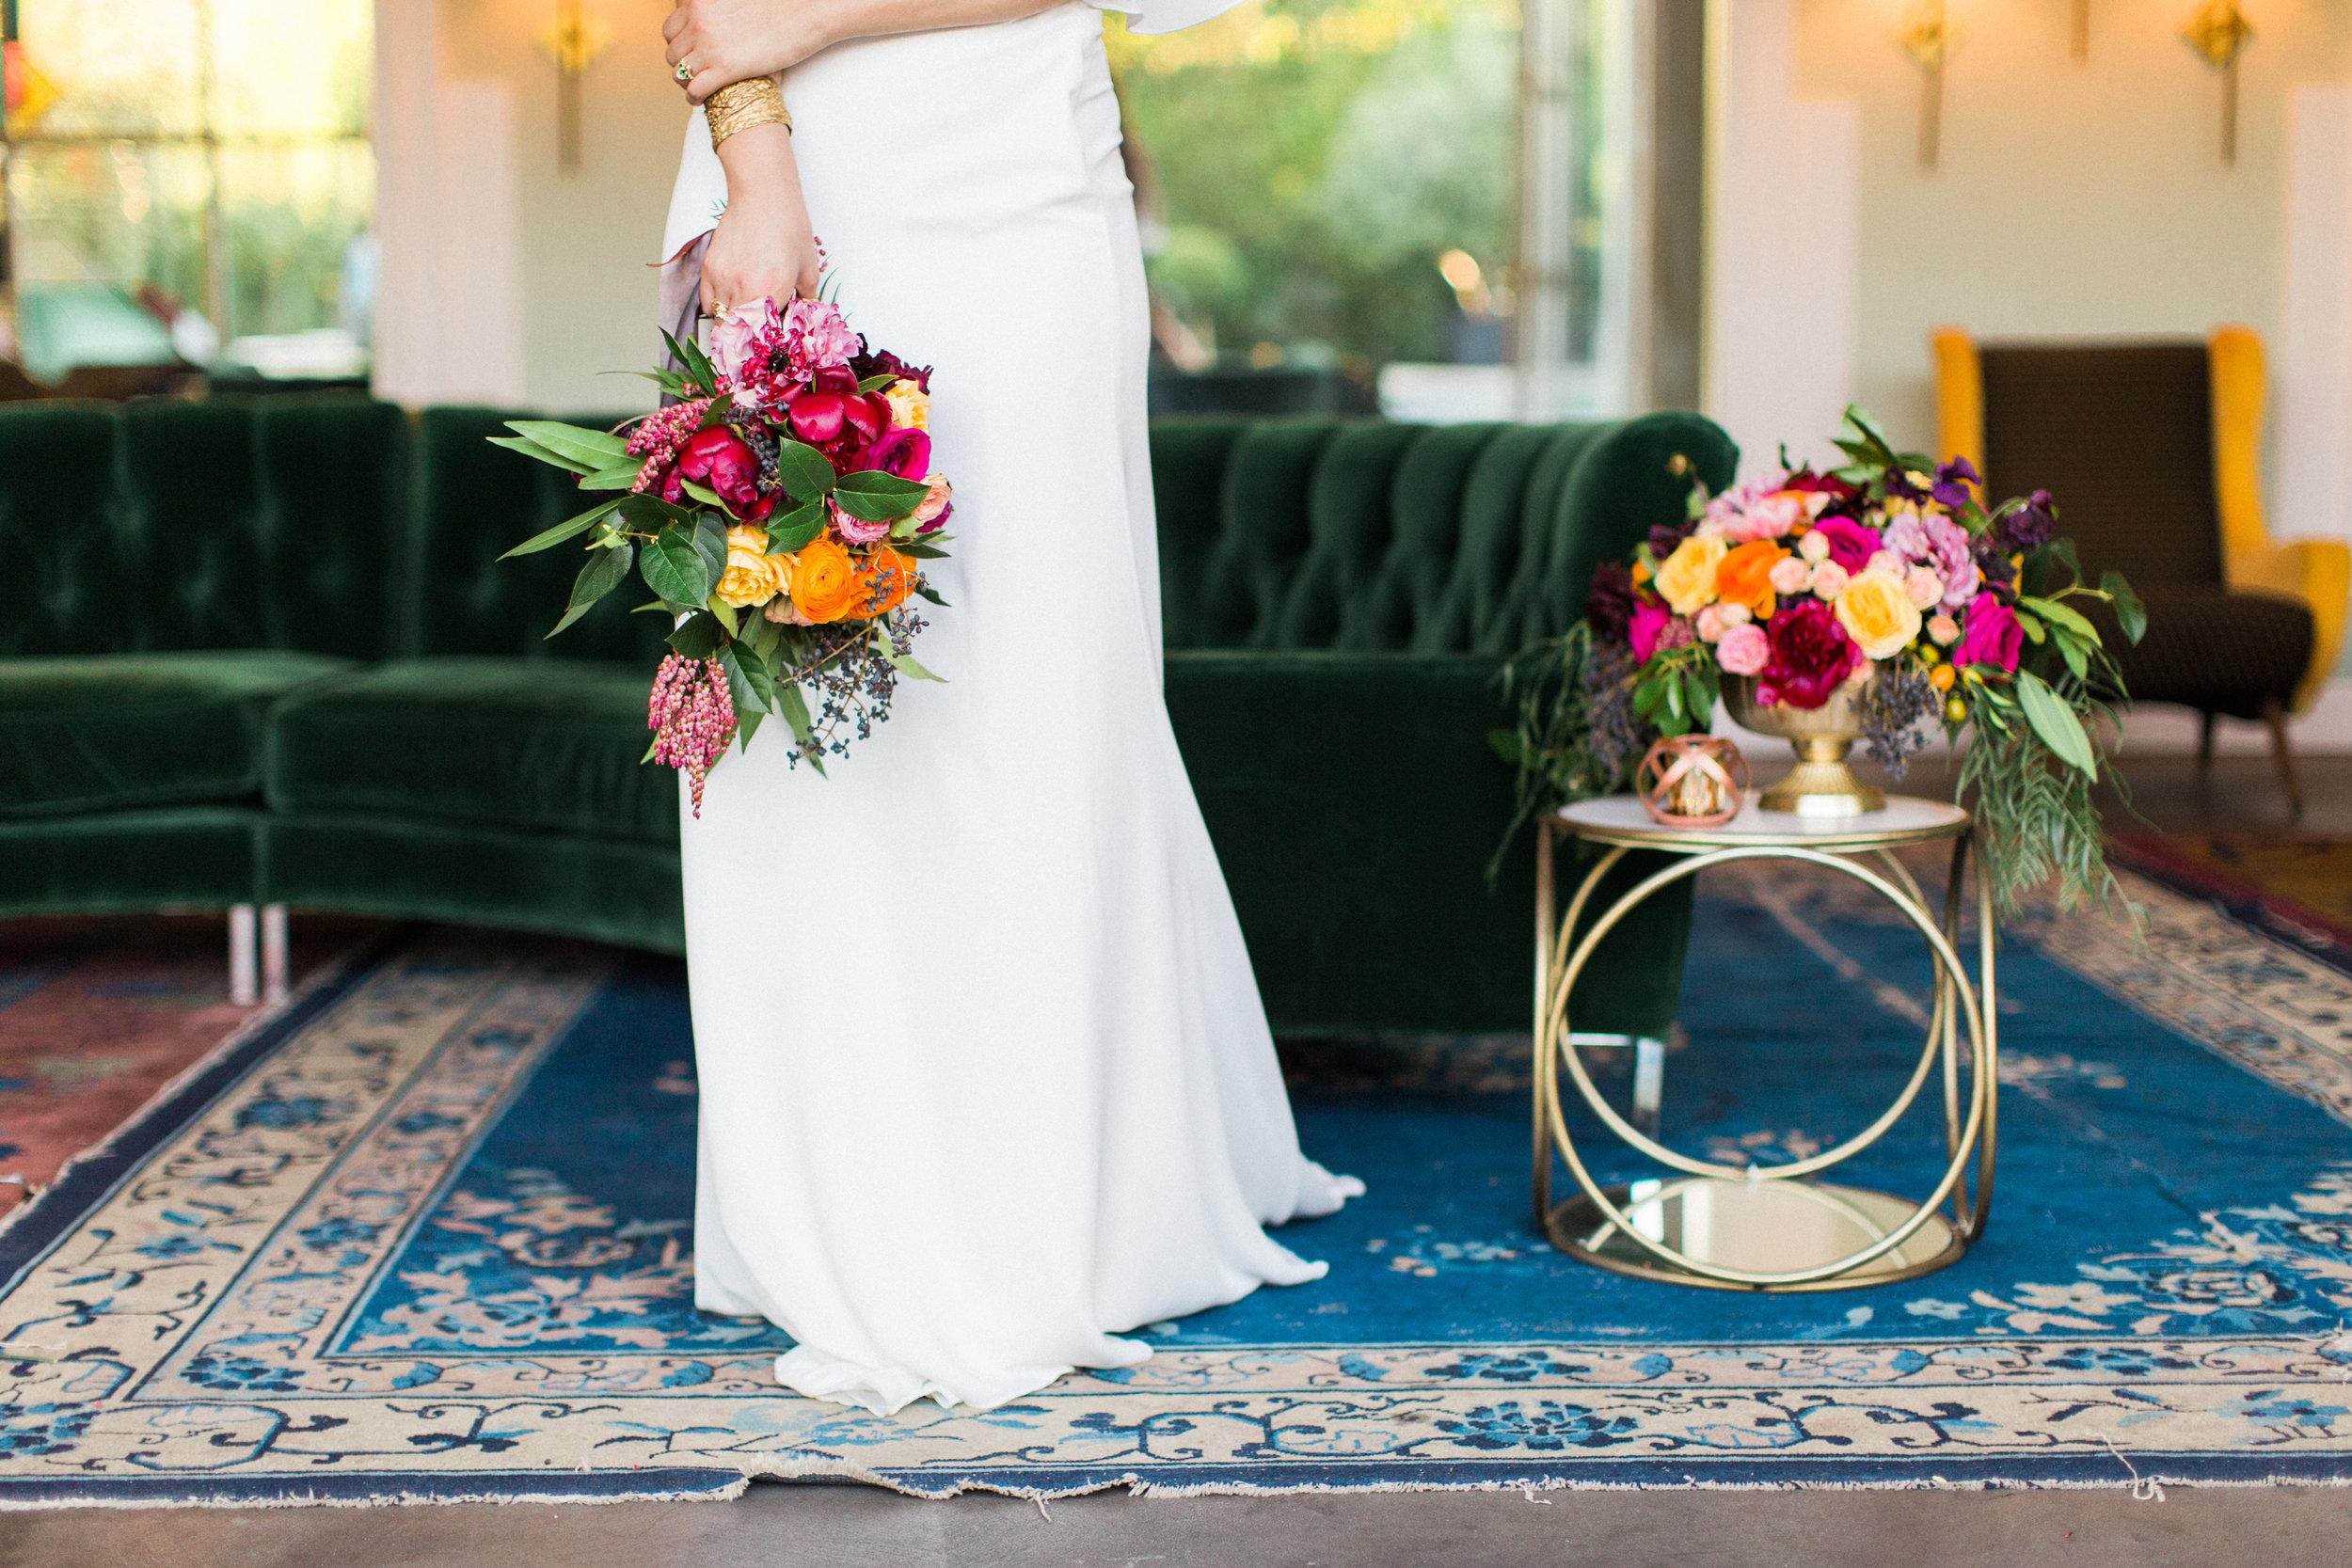 Dark_Rich_Moody_Florals_Sibyl_Sophia_Bouquet_Flowers.jpg